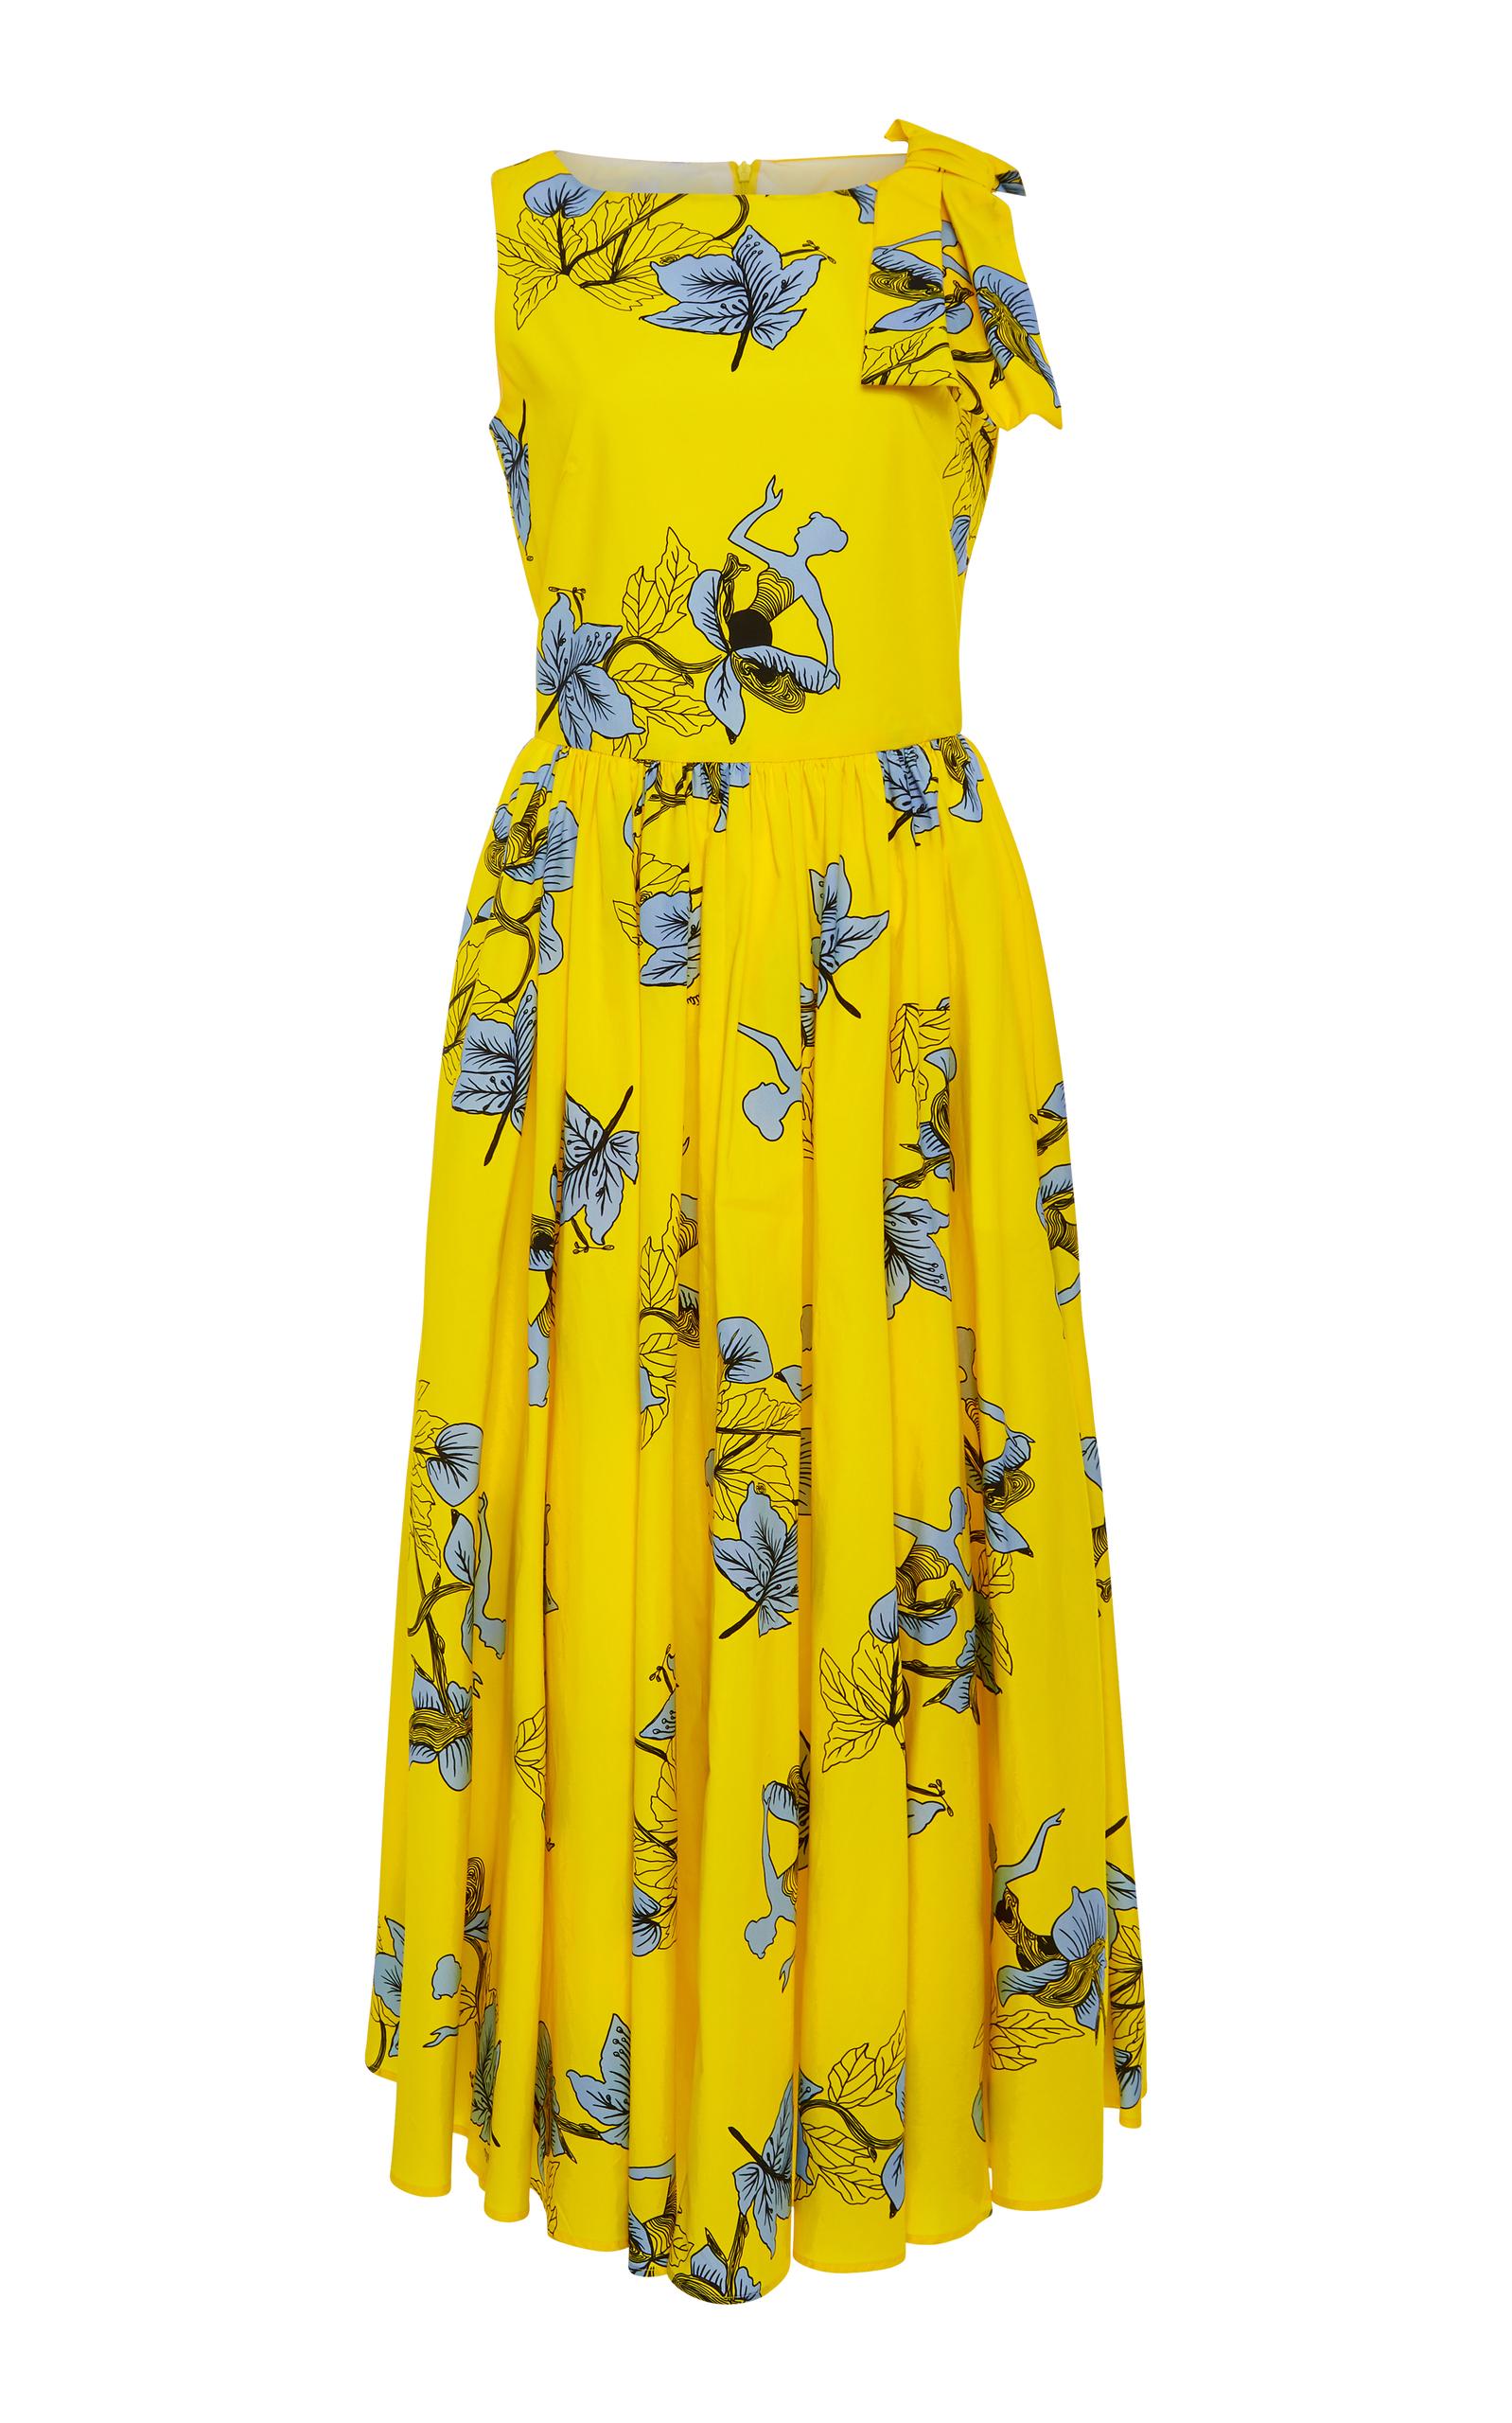 https://assets13.modaoperandi.com/images/products/613524/205835/large_vivetta-yellow-kajam-printed-cotton-dress.jpg?_t=1525378154